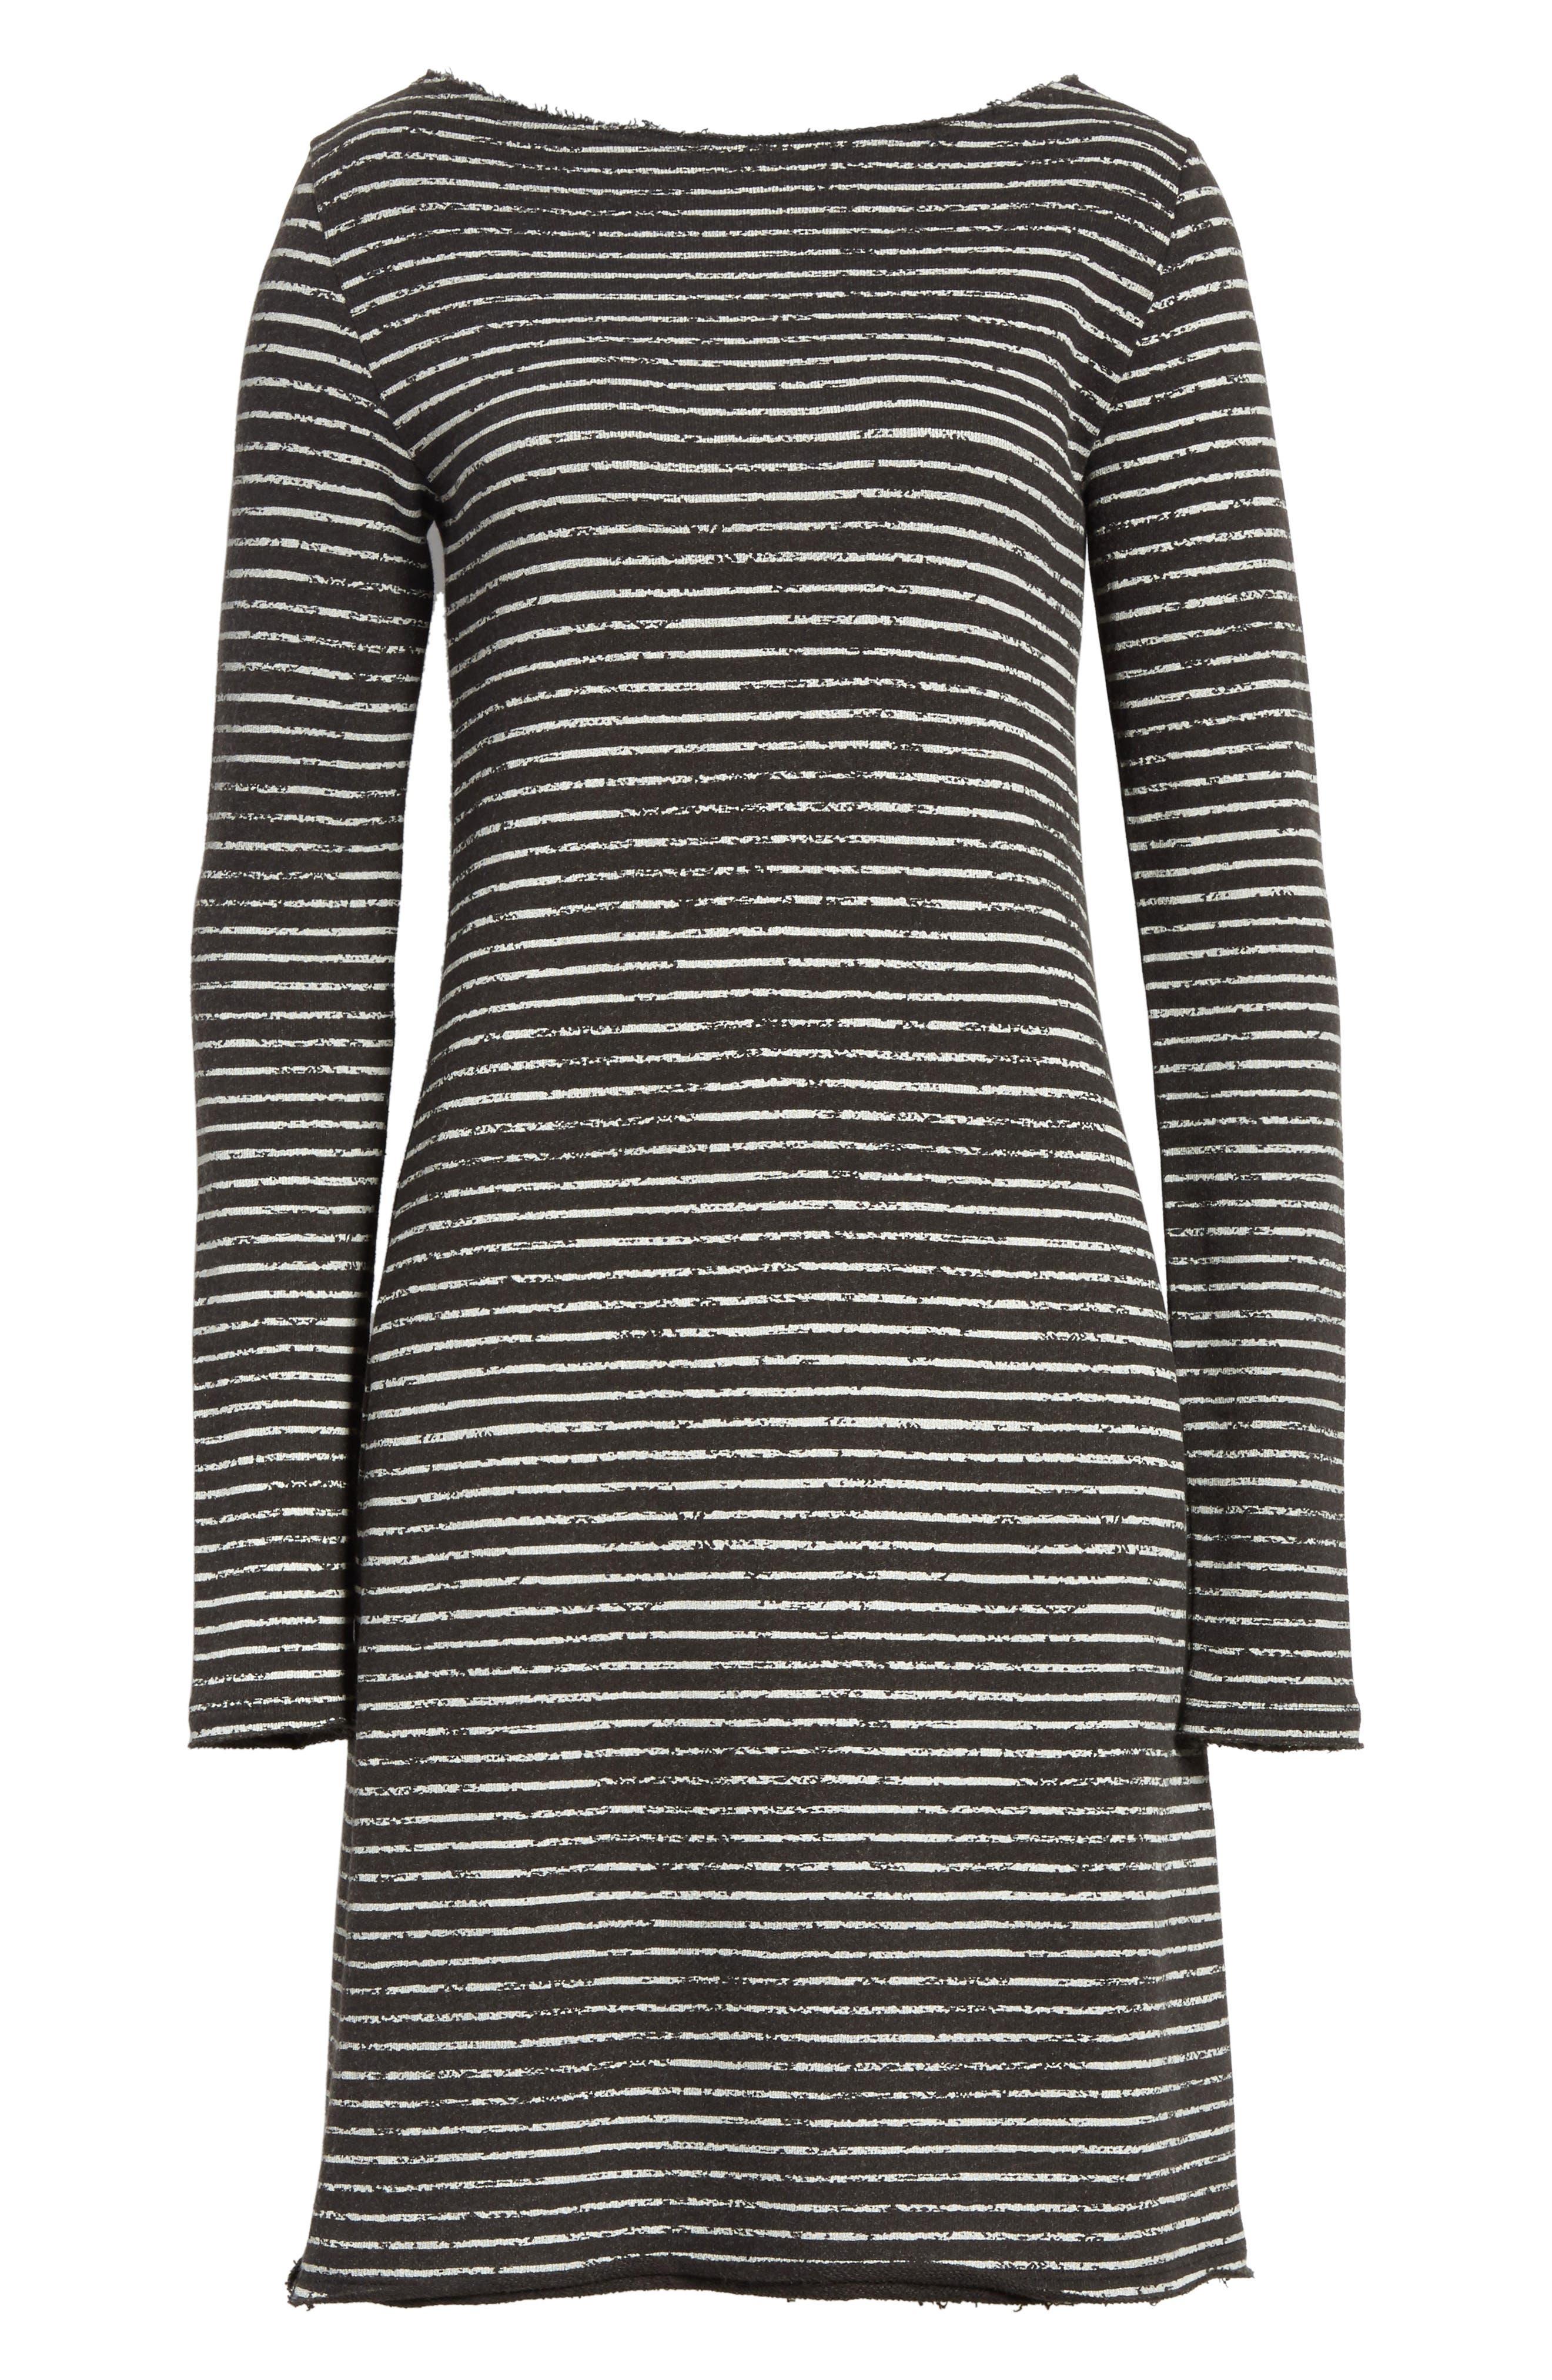 Broken Stripe French Terry Dress,                             Alternate thumbnail 6, color,                             Charcoal Combo Stripe